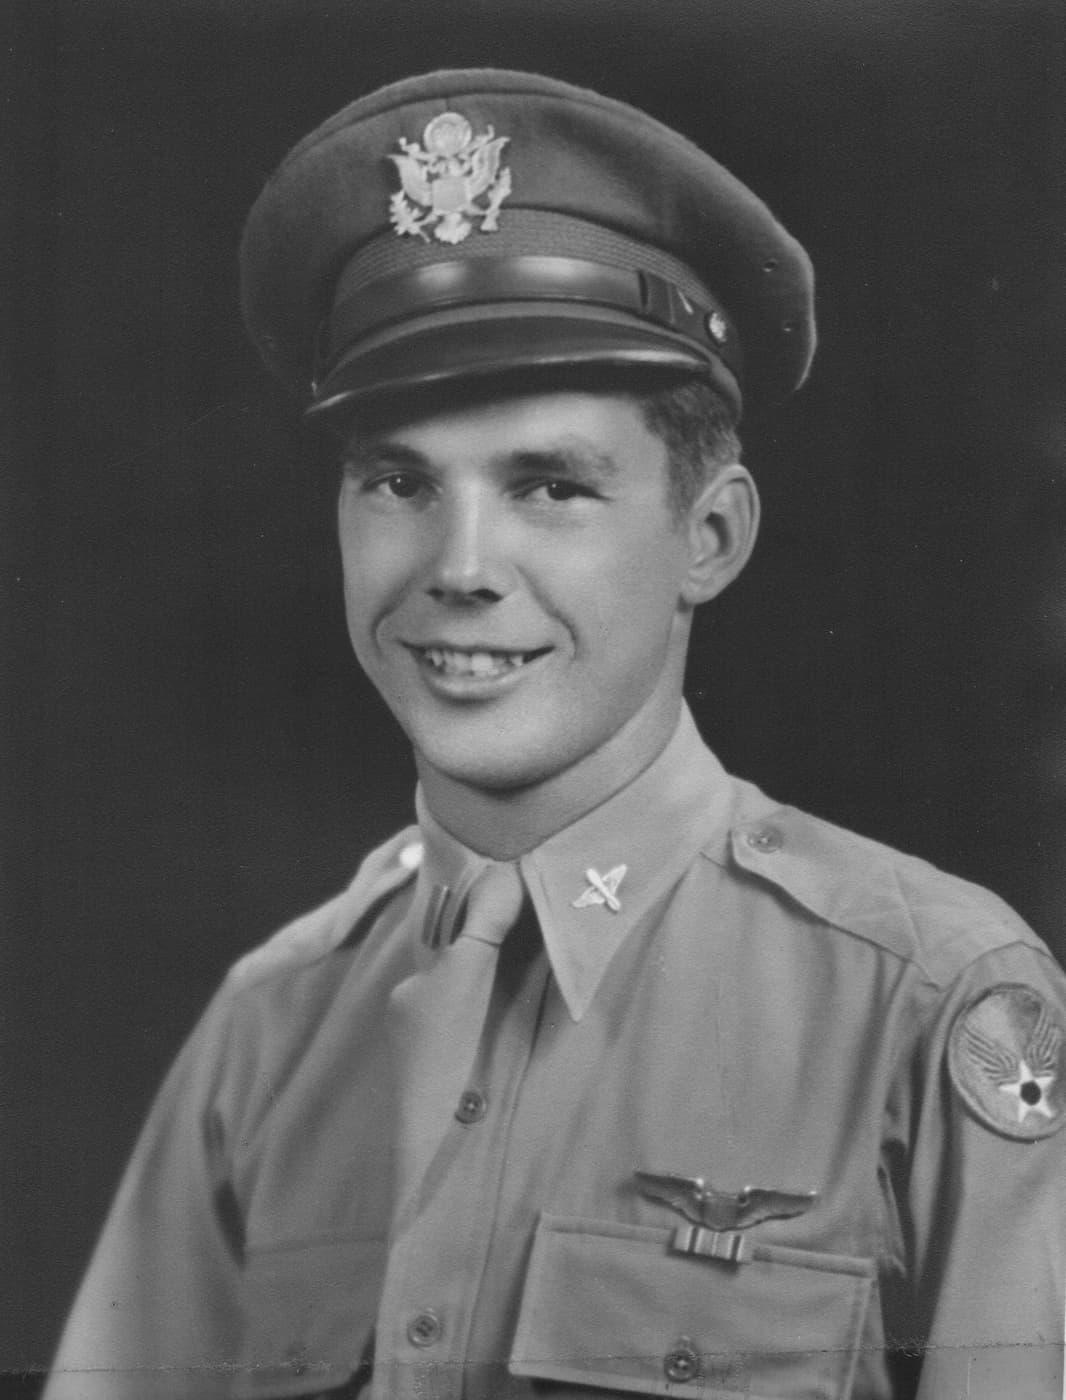 1st Lieutenant Bill Francis Moore